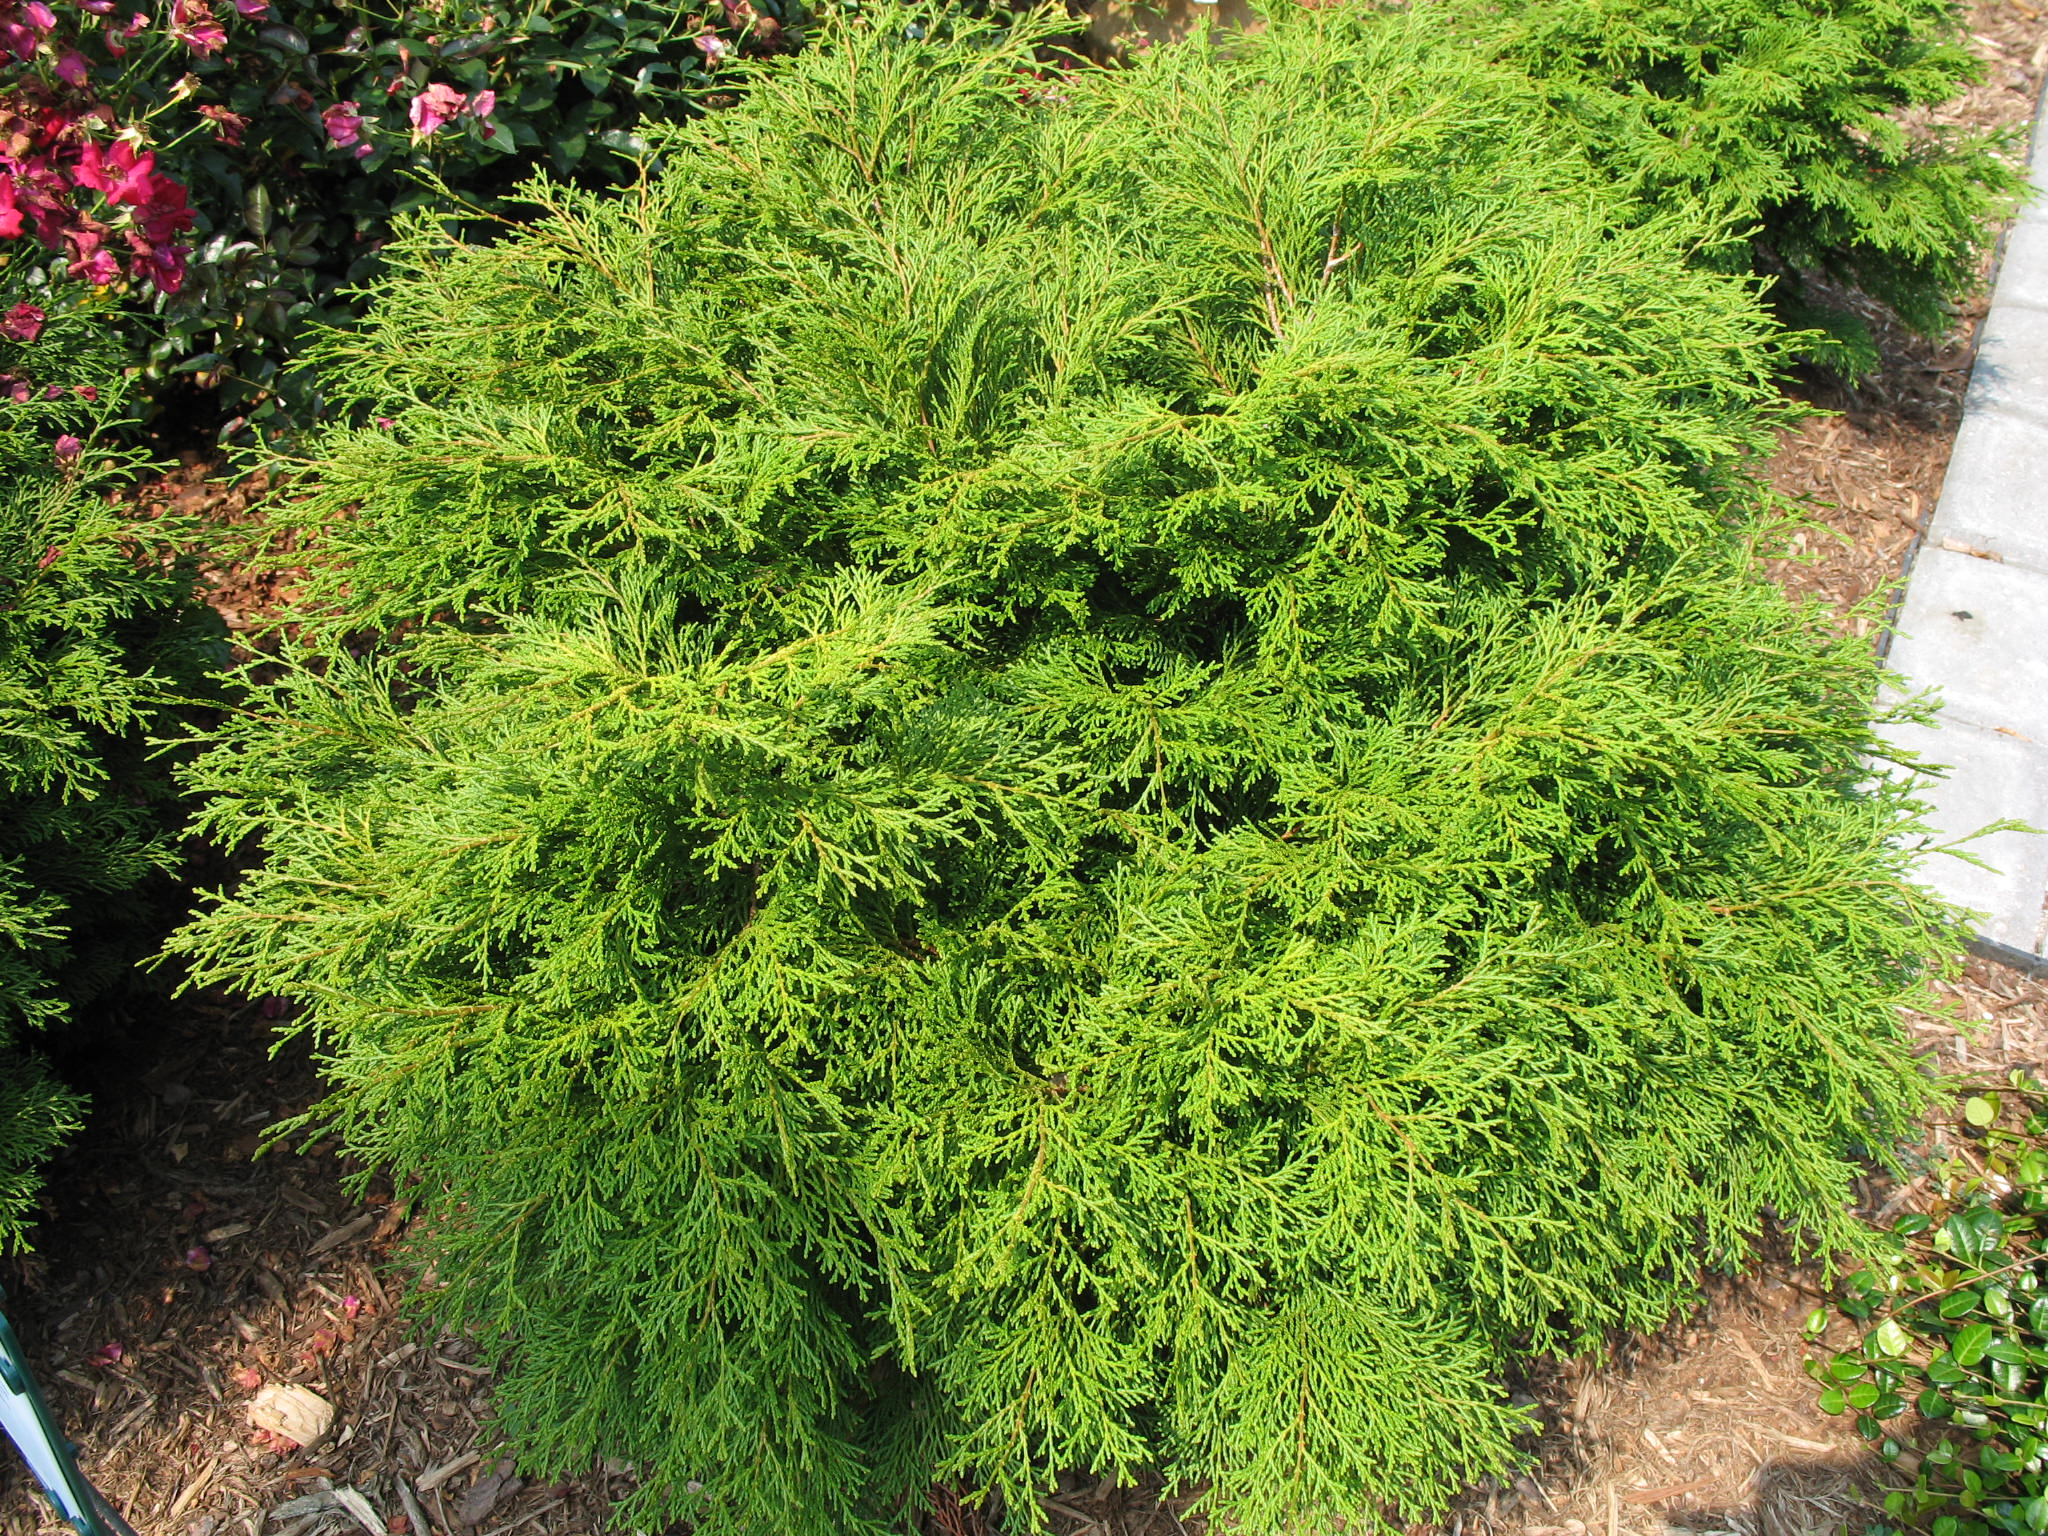 Chamaecyparis pisifera 'Squarrosa Minima'   / Chamaecyparis pisifera 'Squarrosa Minima'